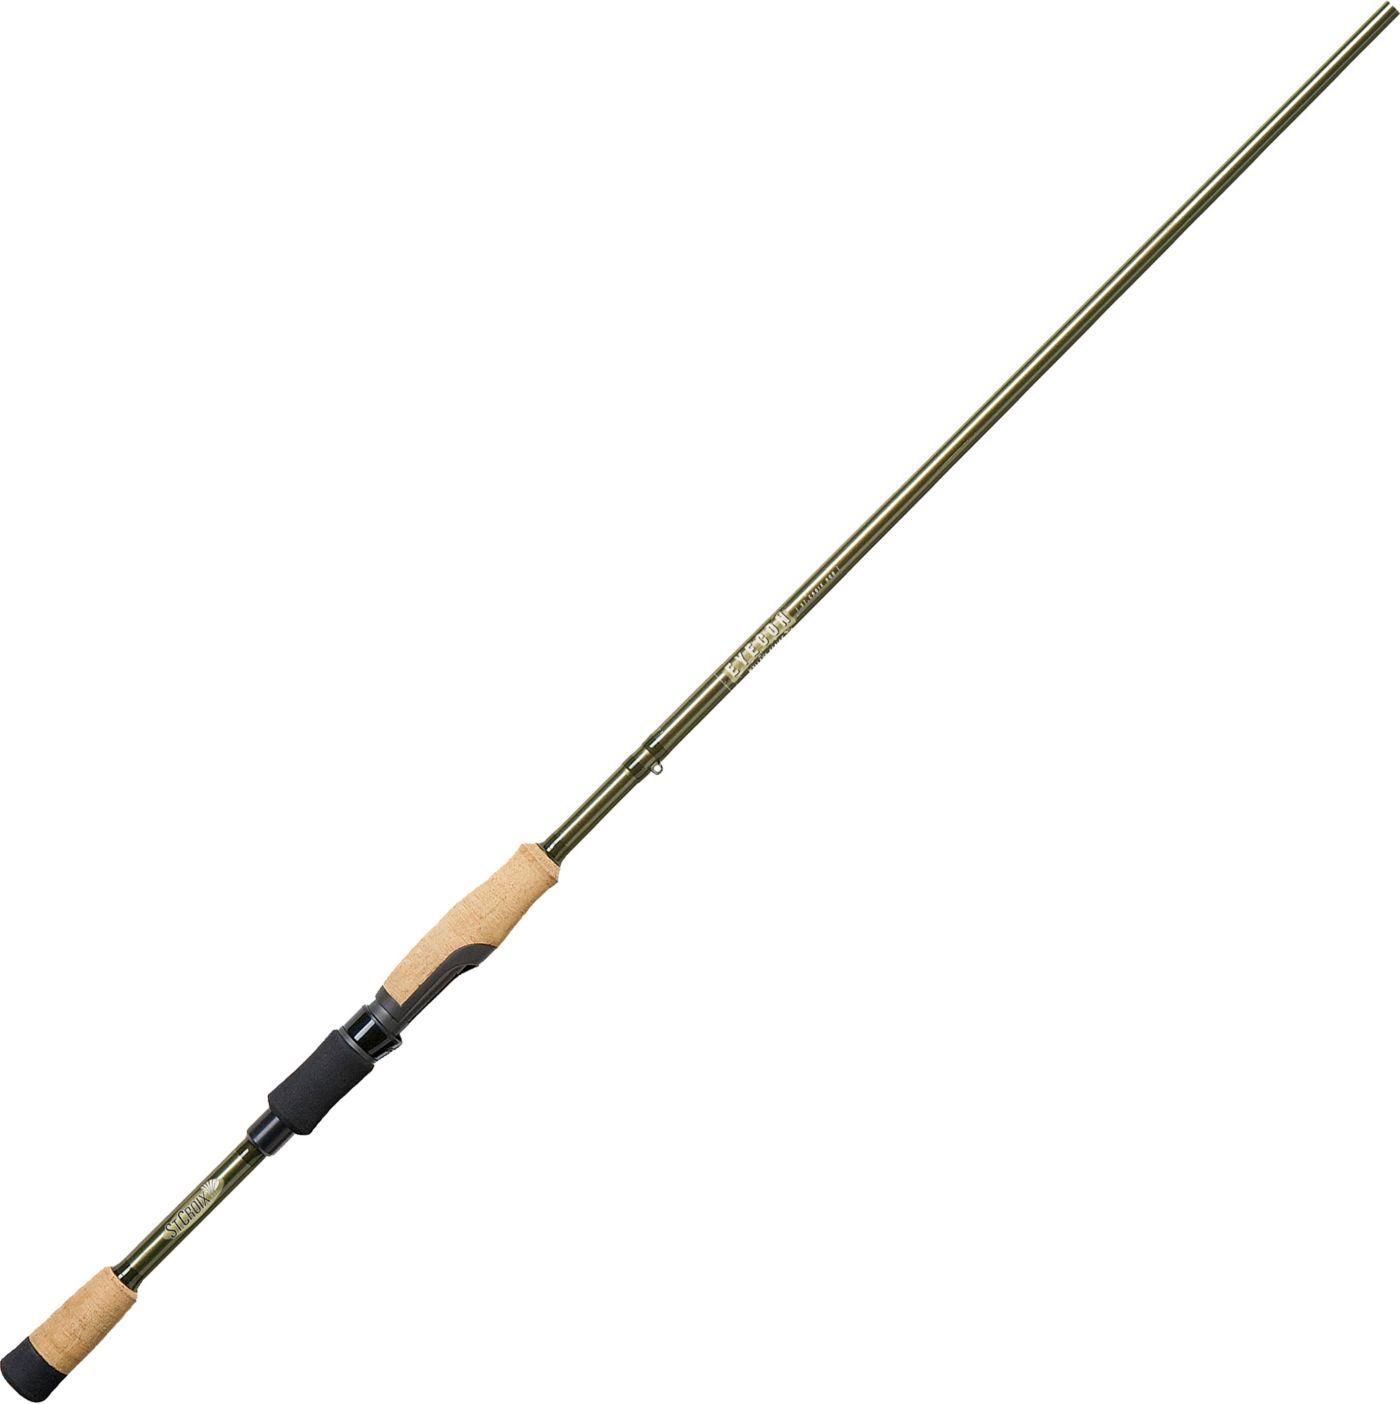 St. Croix Eyecon Spinning Rod